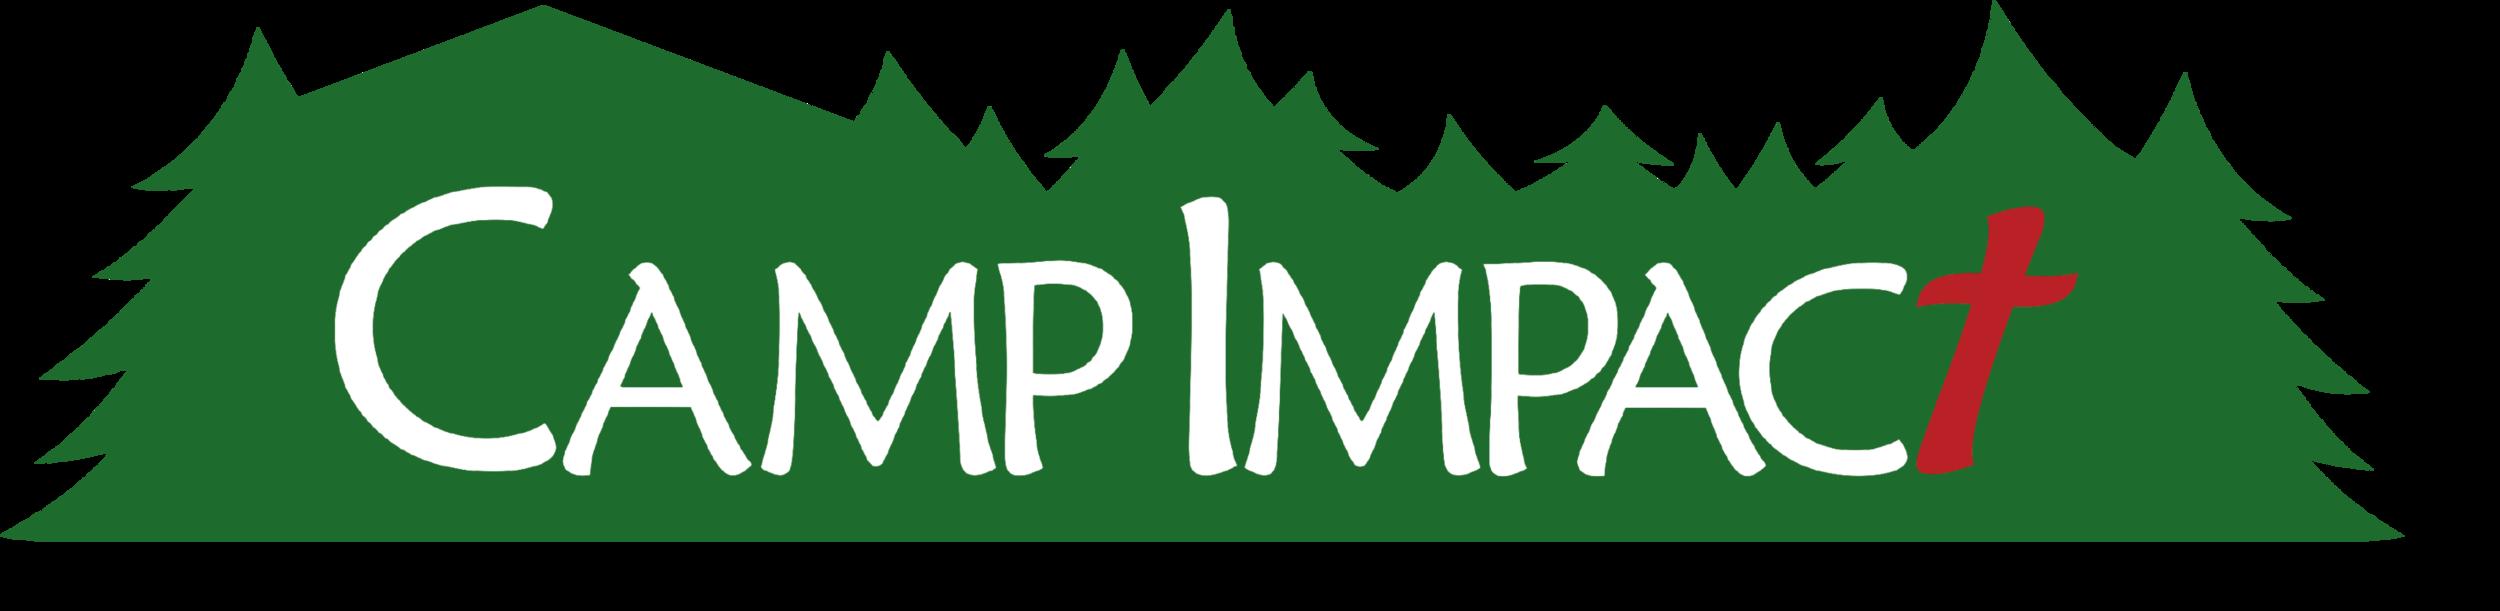 NEW Logo Camp Impact_FINAL-1.png